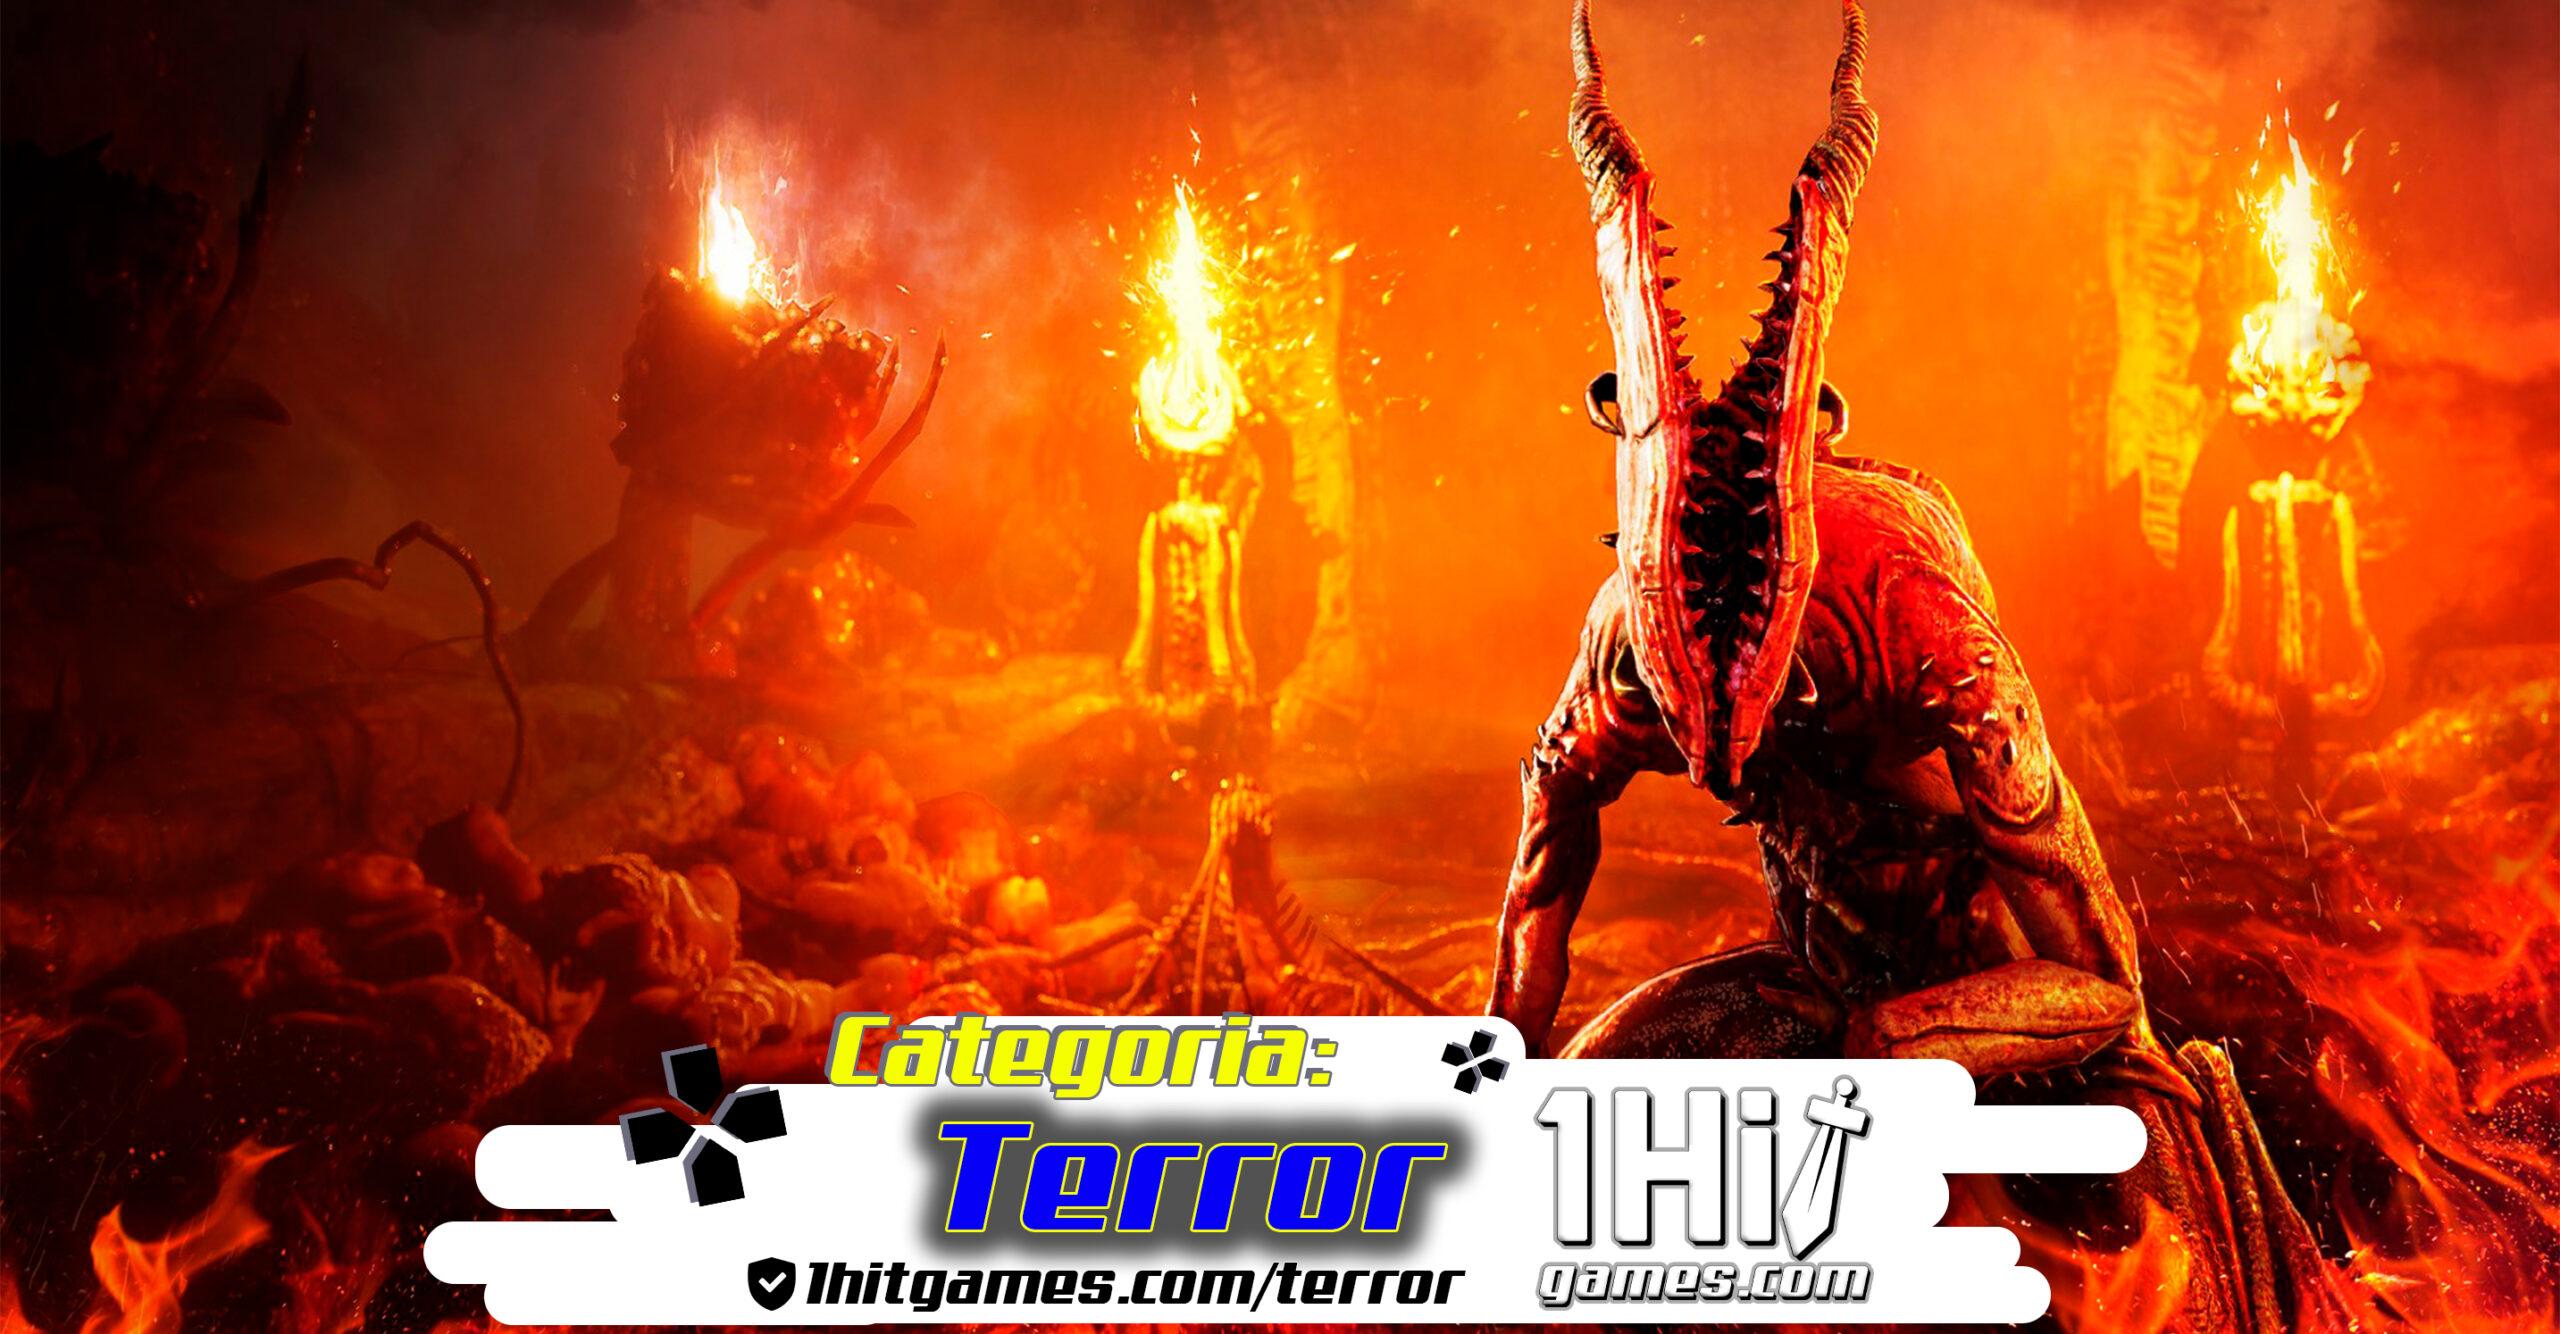 terror games 1hitgames jogos eletronicos categorias 1hit